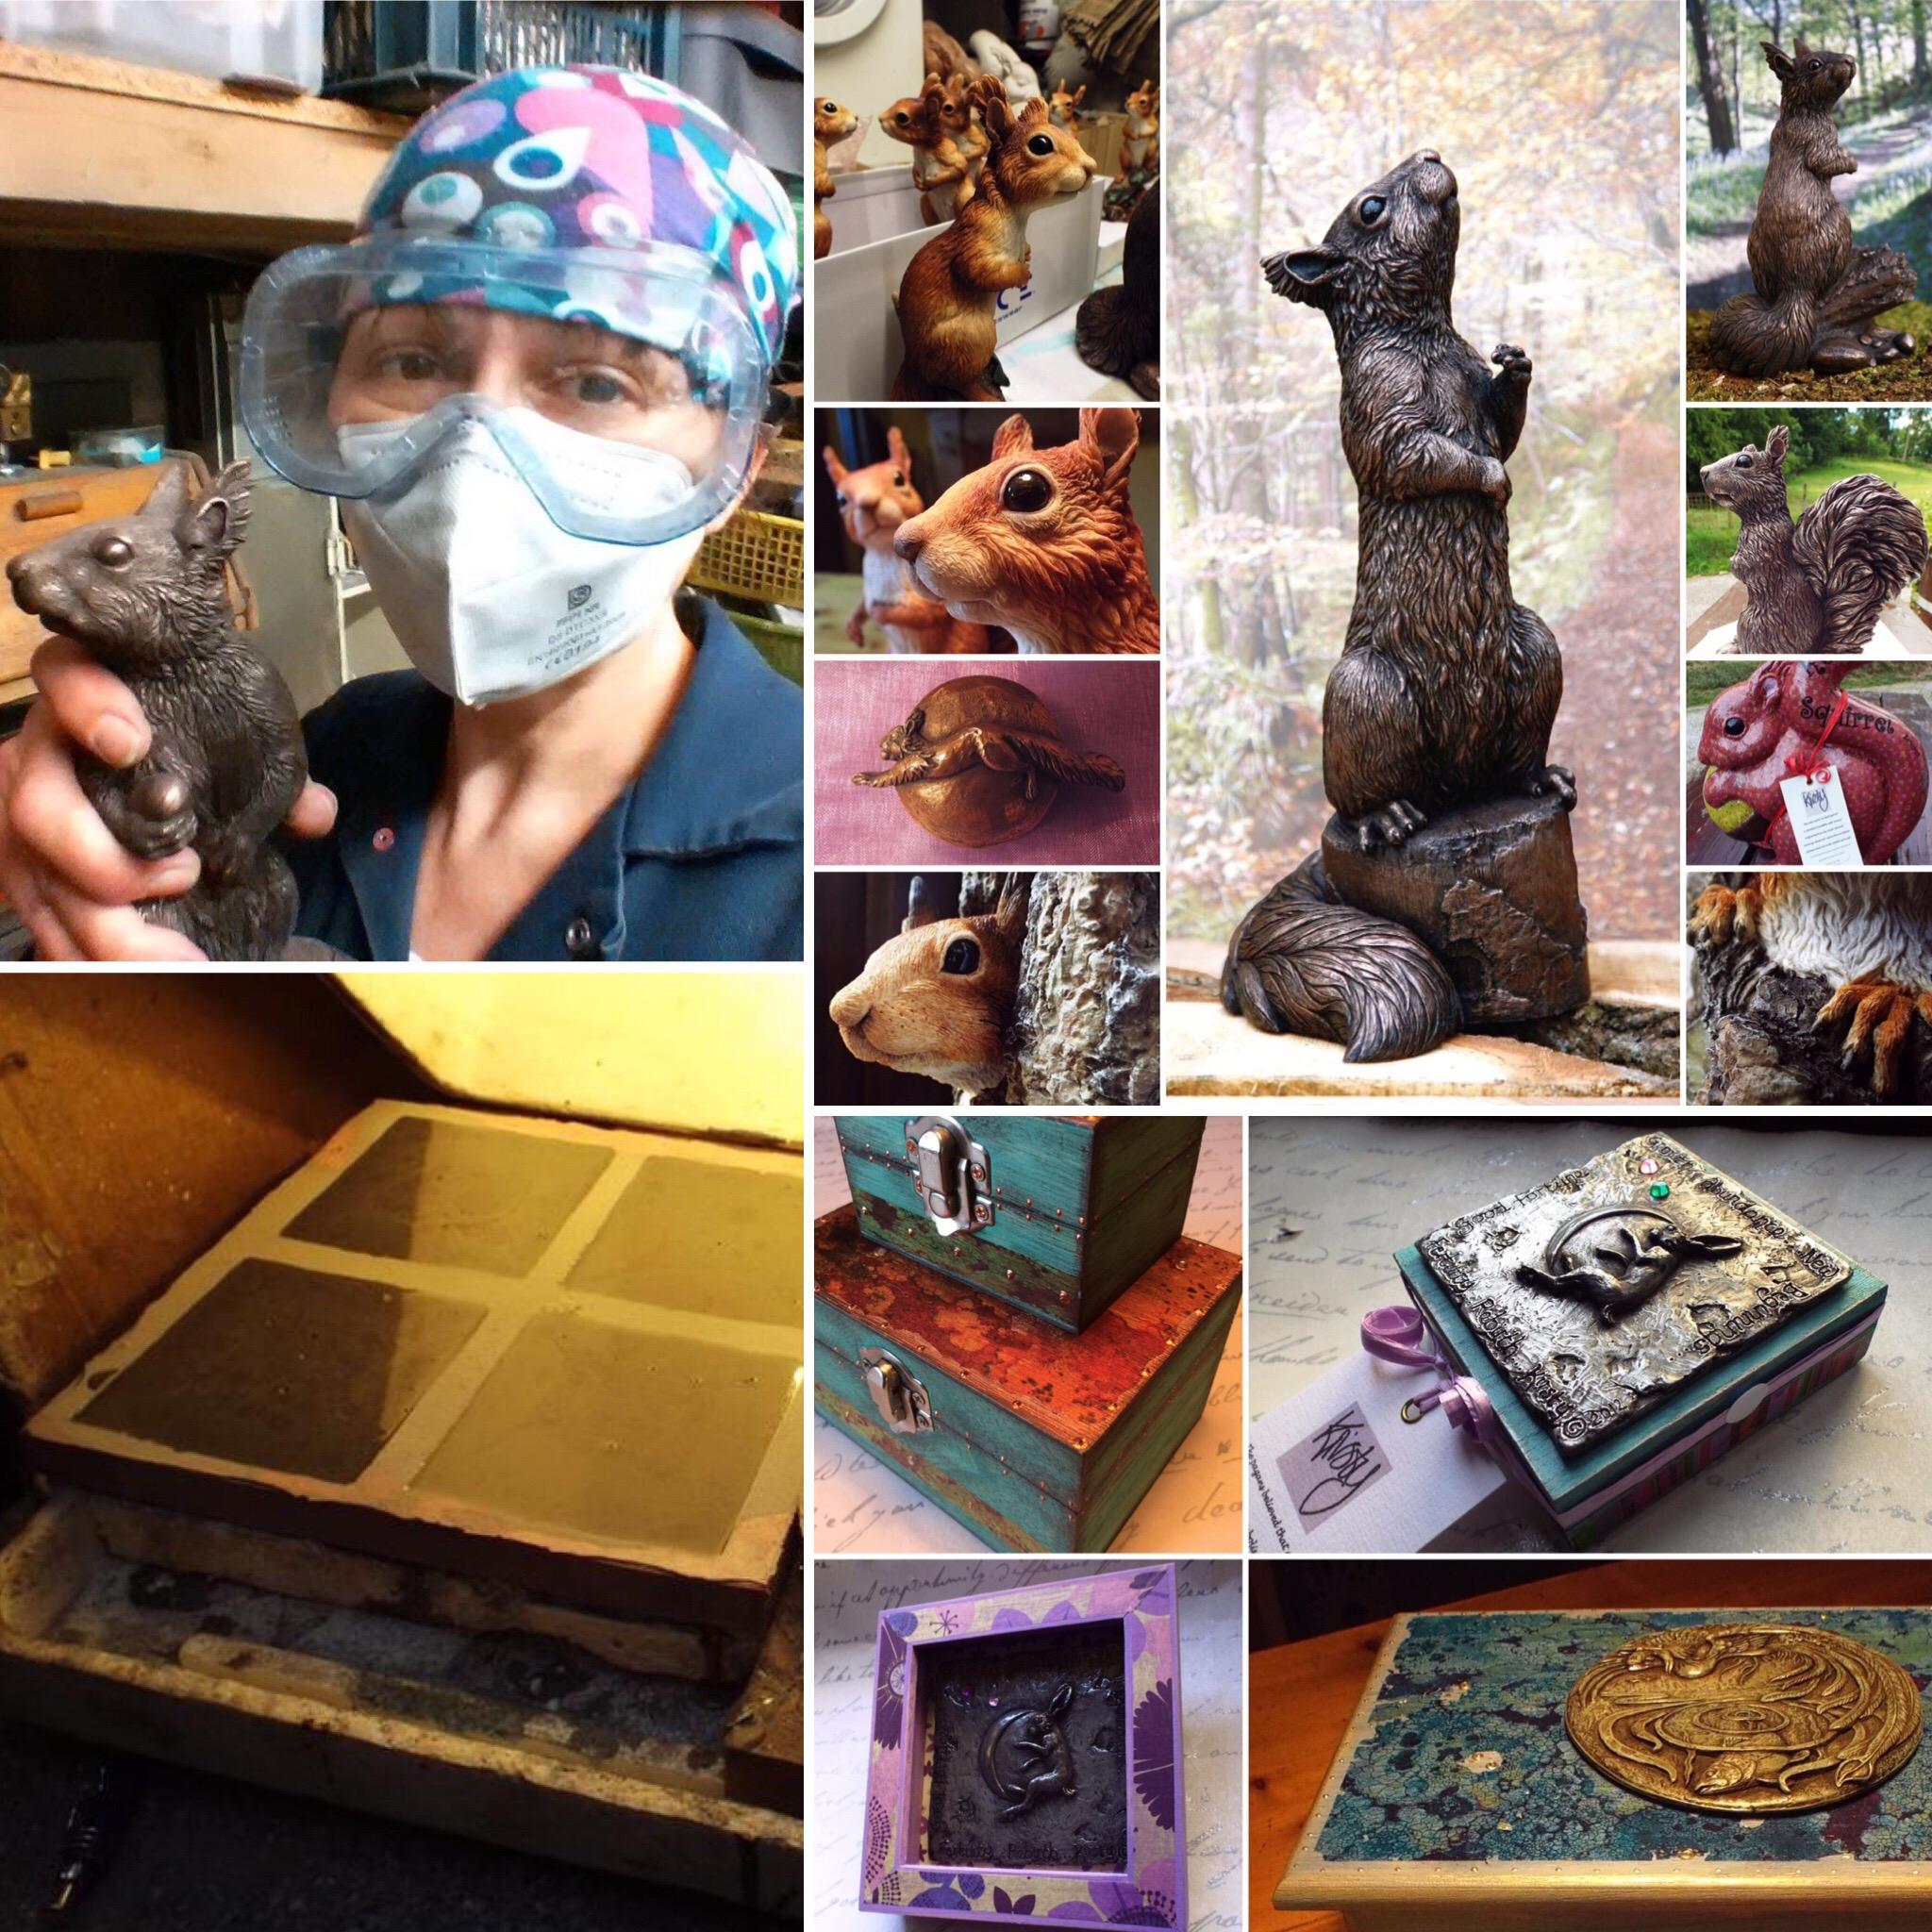 Squirrel, casting, boxes